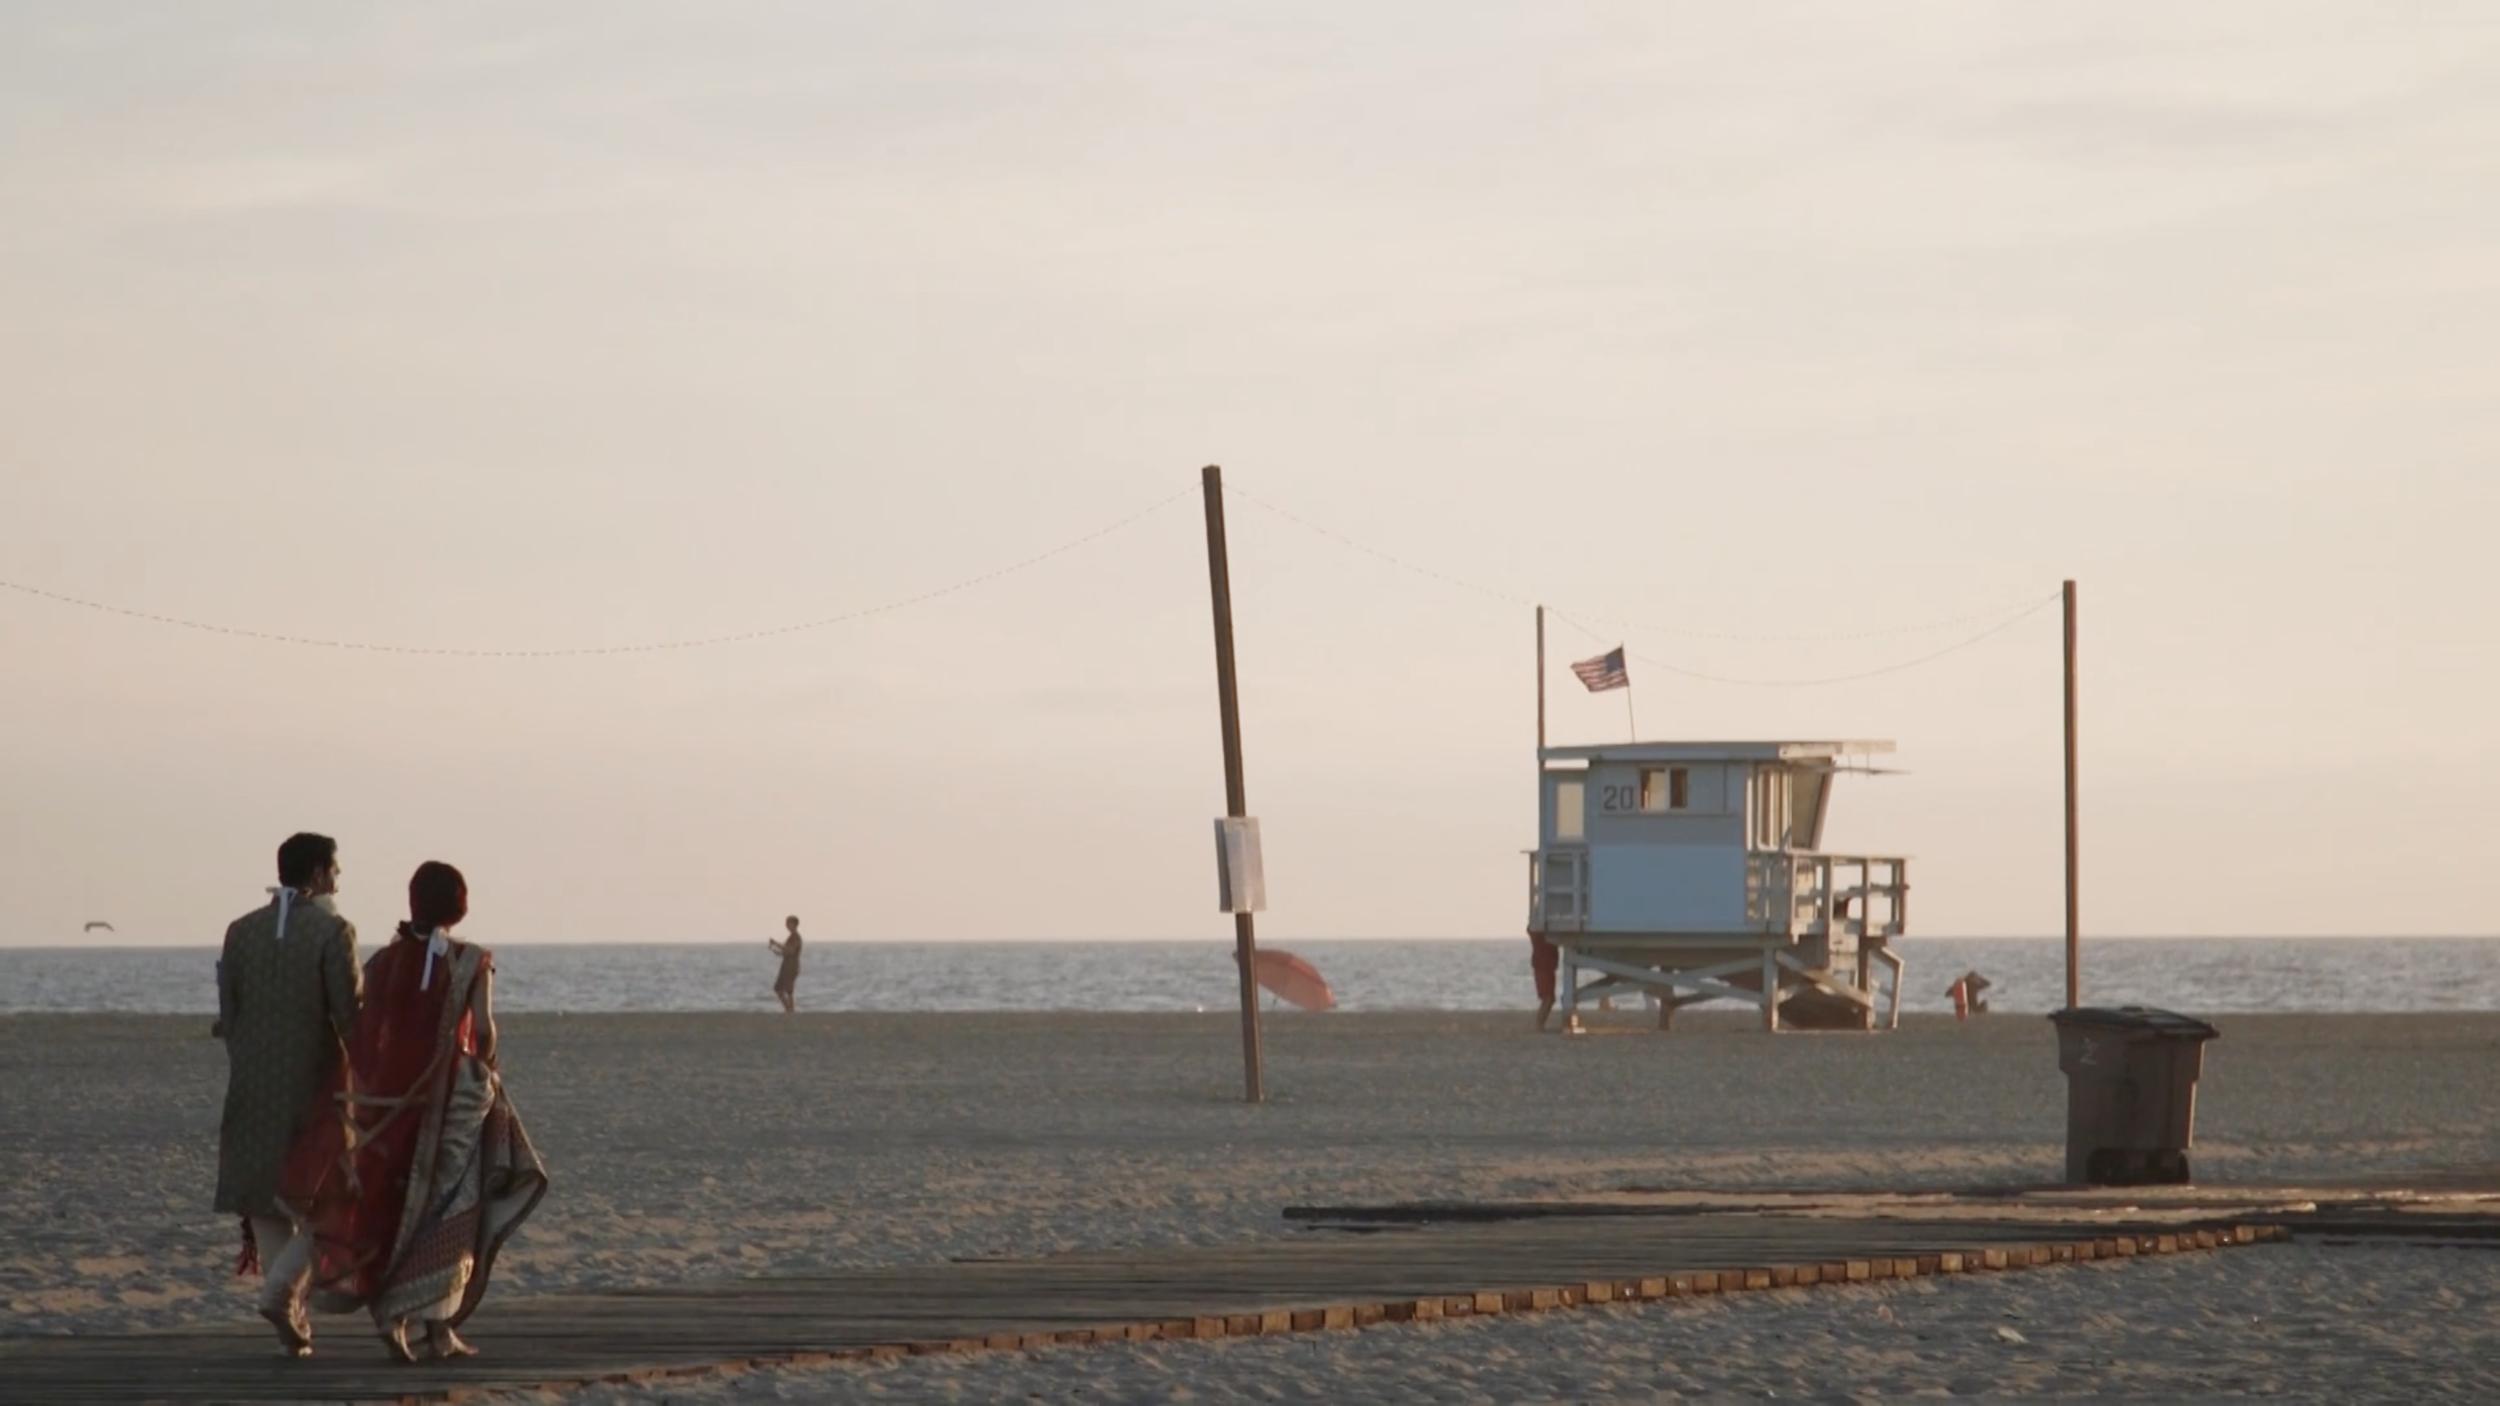 indian-wedding-couple-boardwalk-beach.png